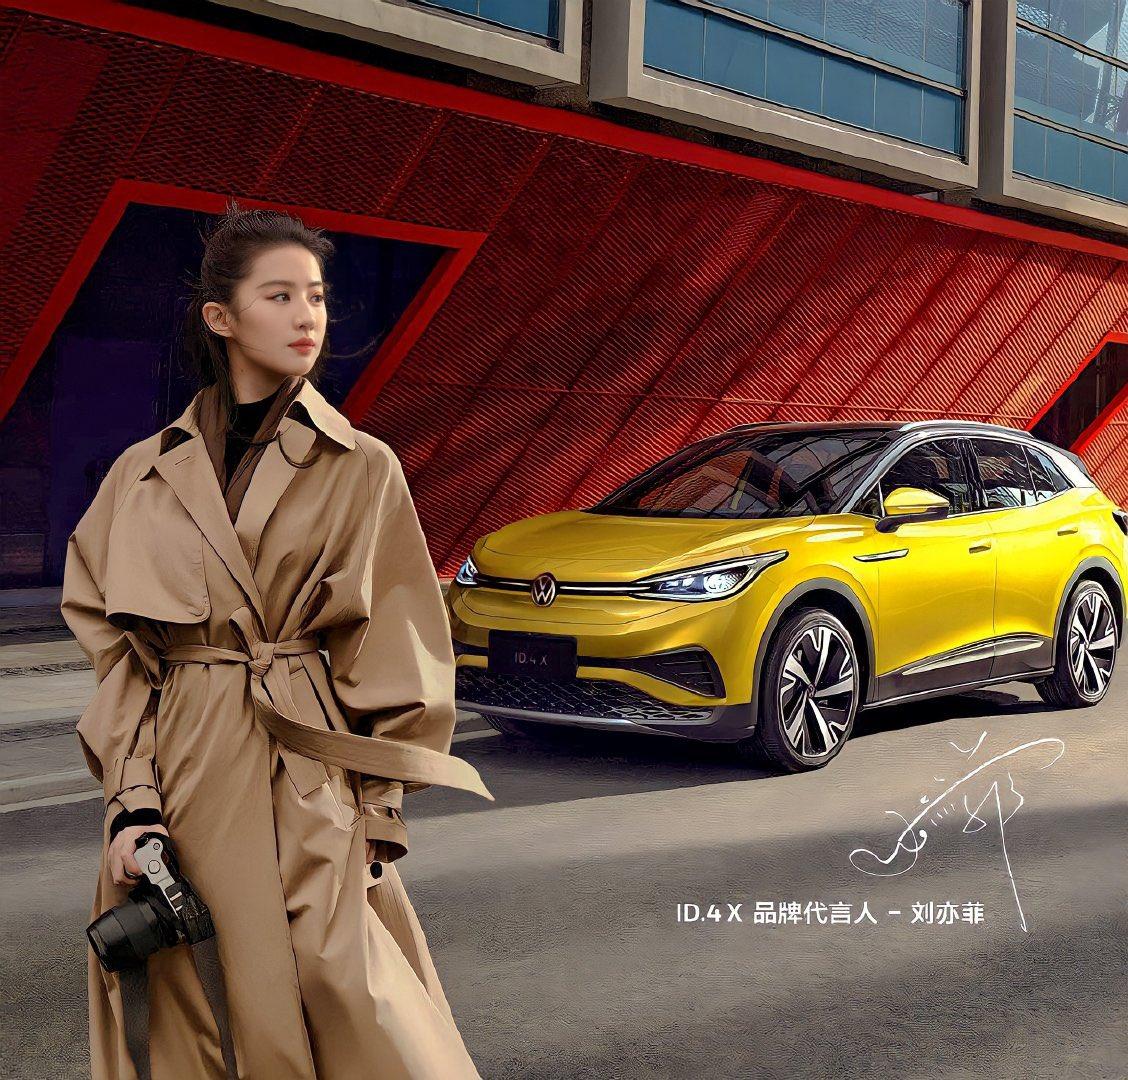 SAIC Volkswagen released the newest campaign with its ID. 4X ambassador Yifei Liu or Liu Yifei.   #LiuYifei #YifeiLiu #CrystalLiu #Mulan #Volkswagen